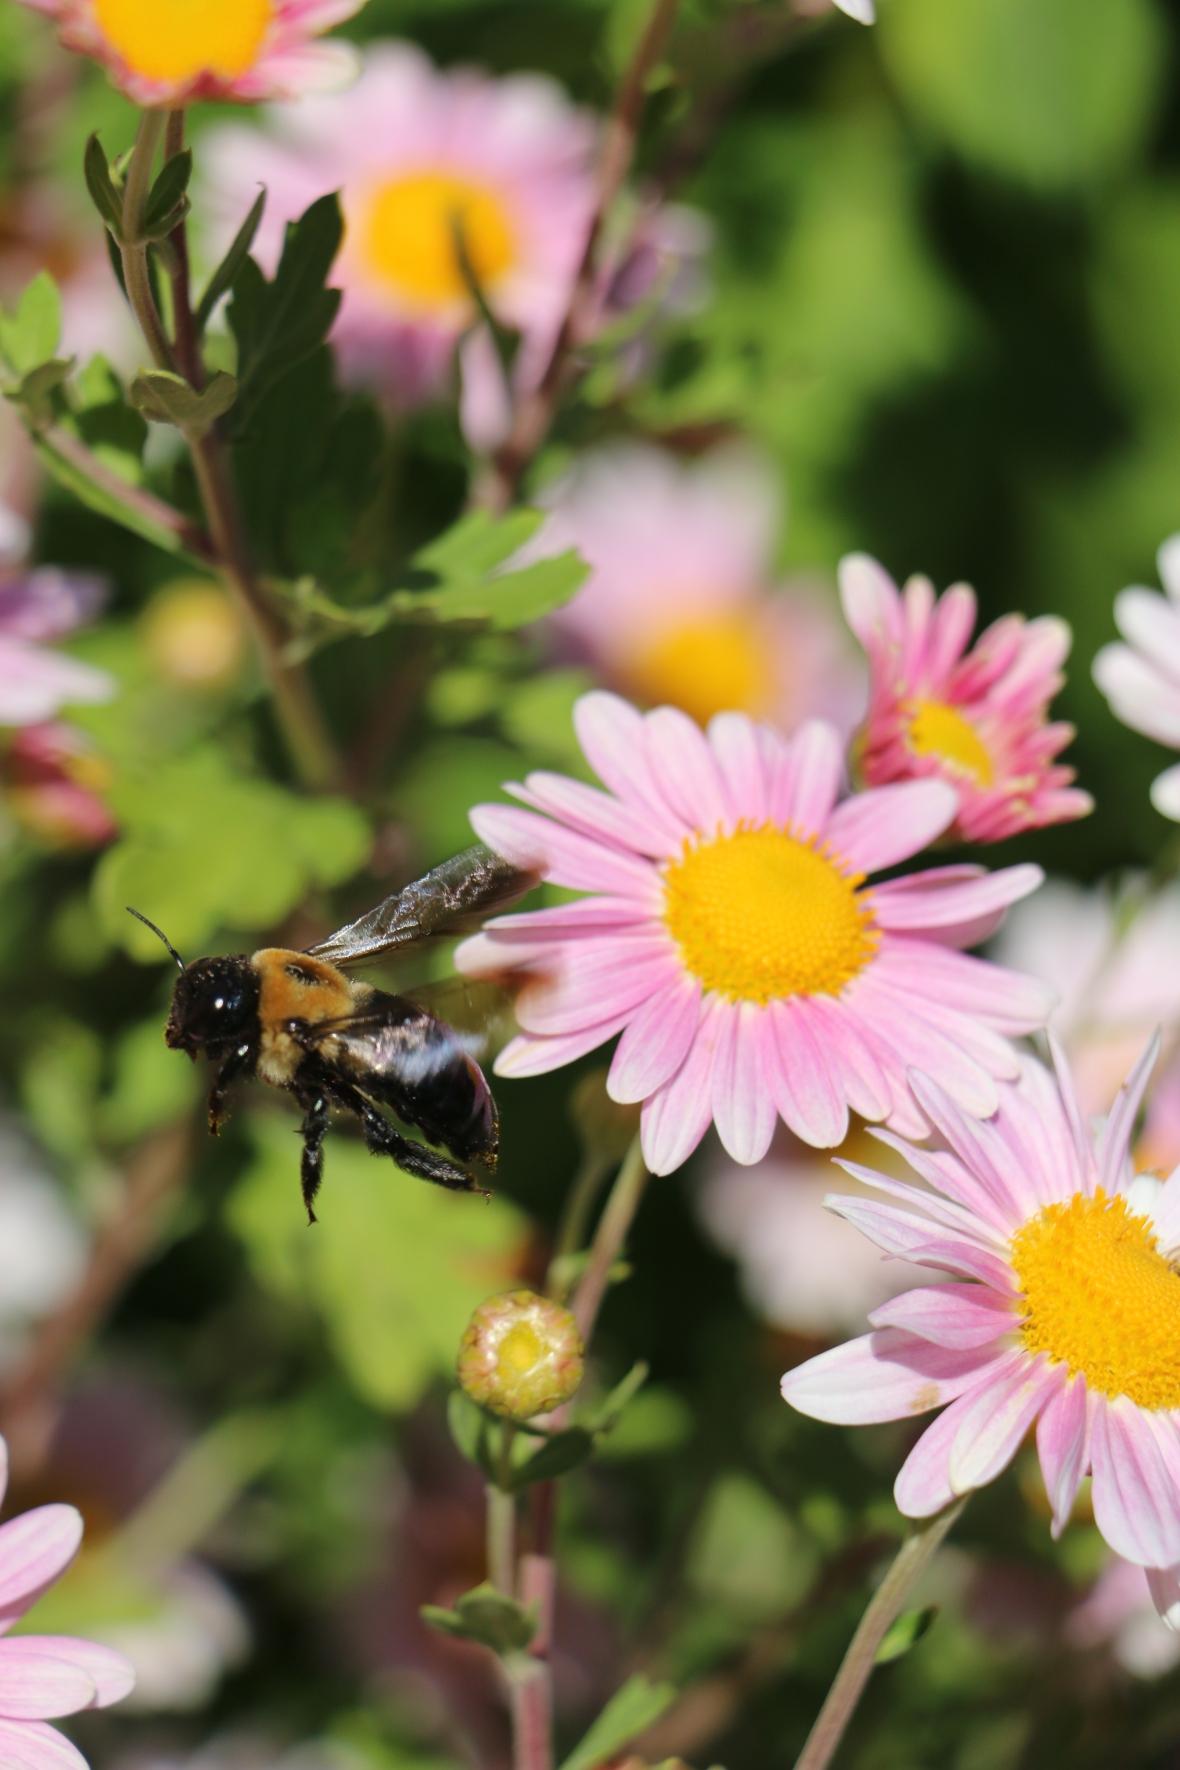 Bumble Bee Mid Flight